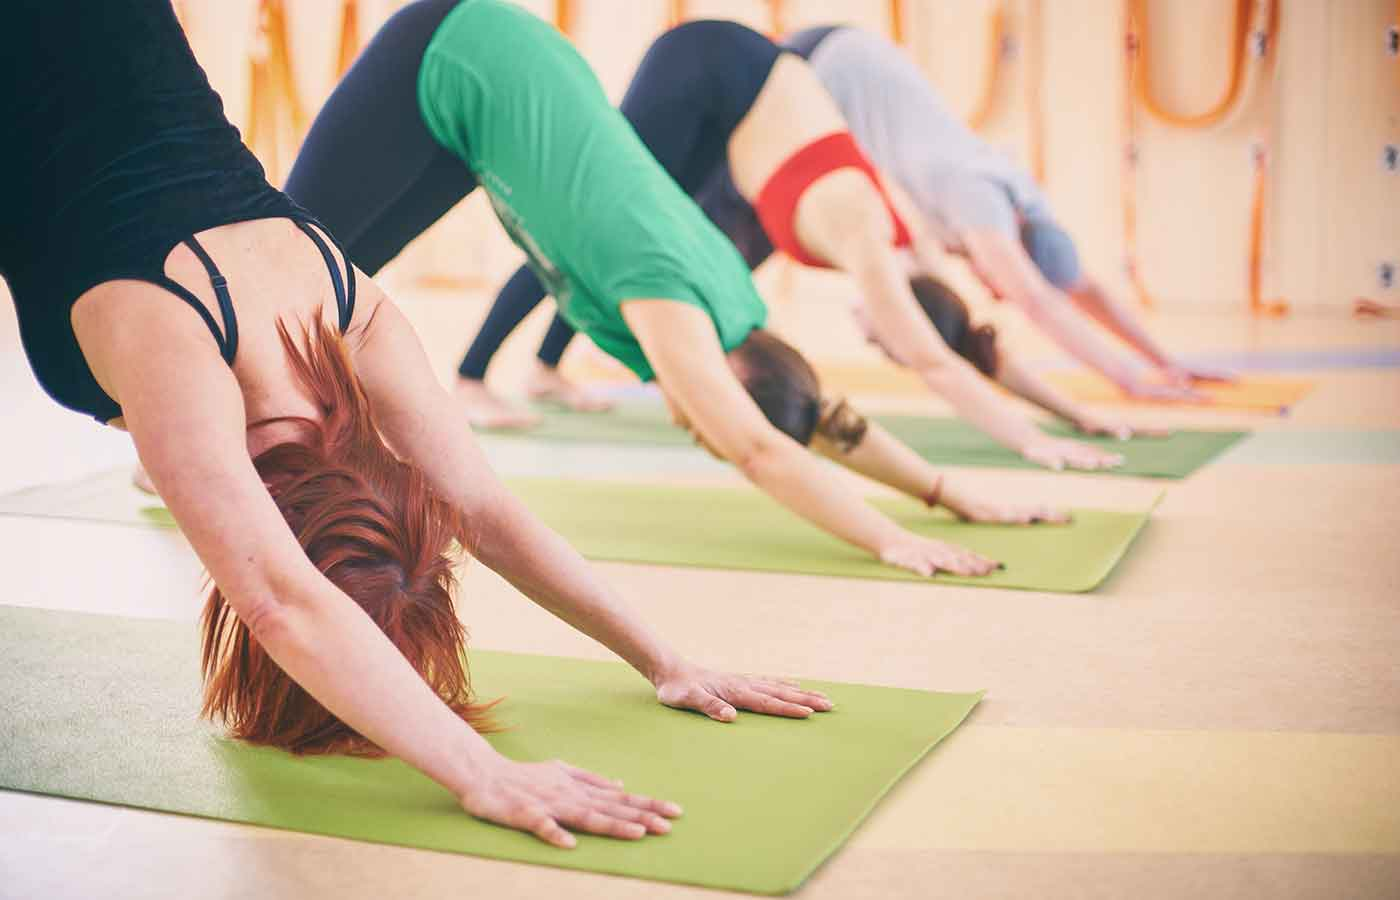 Grupo de personas practicando Iyengar yoga